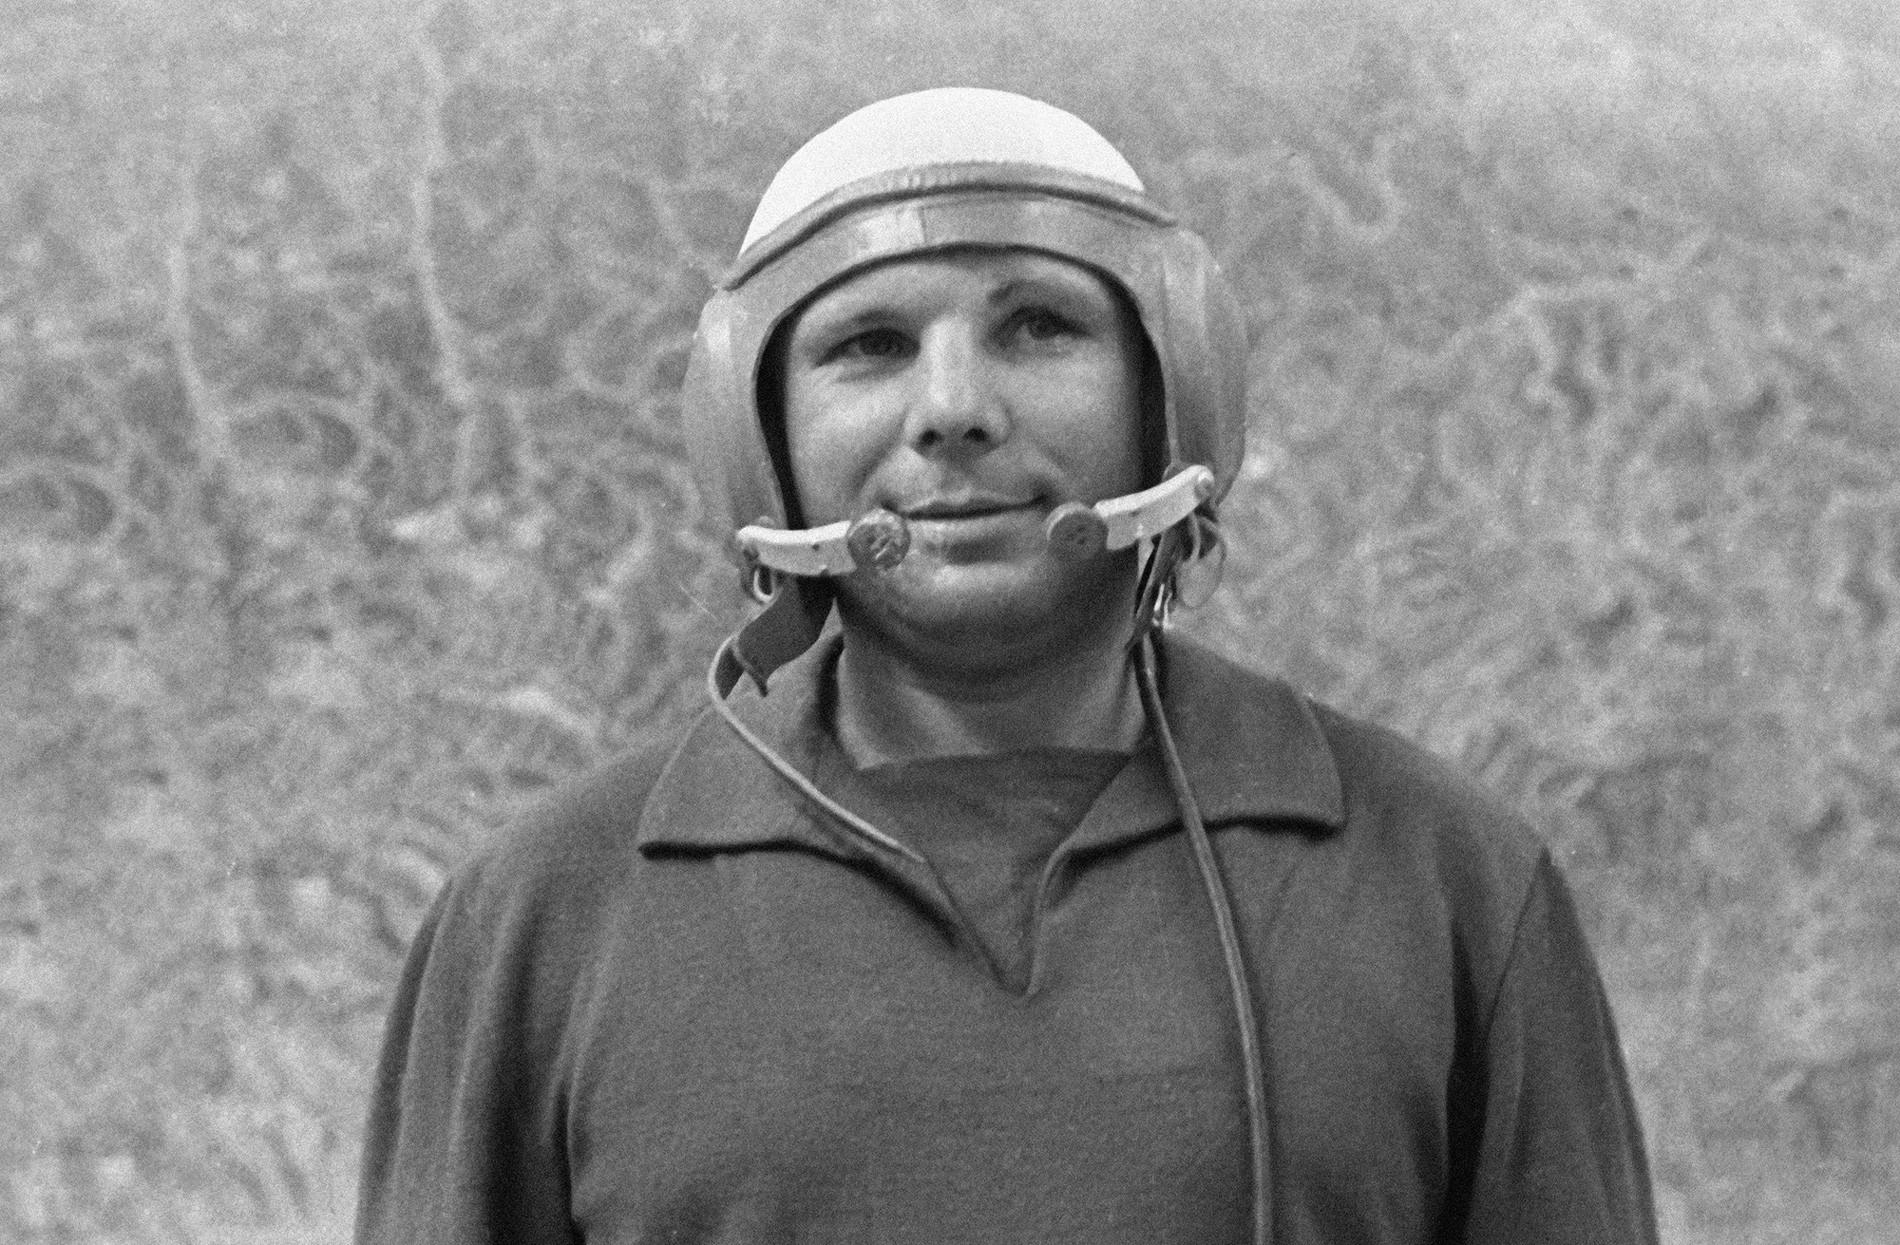 Пилот и космонаут Јуриј Гагарин, 1. јун 1962.